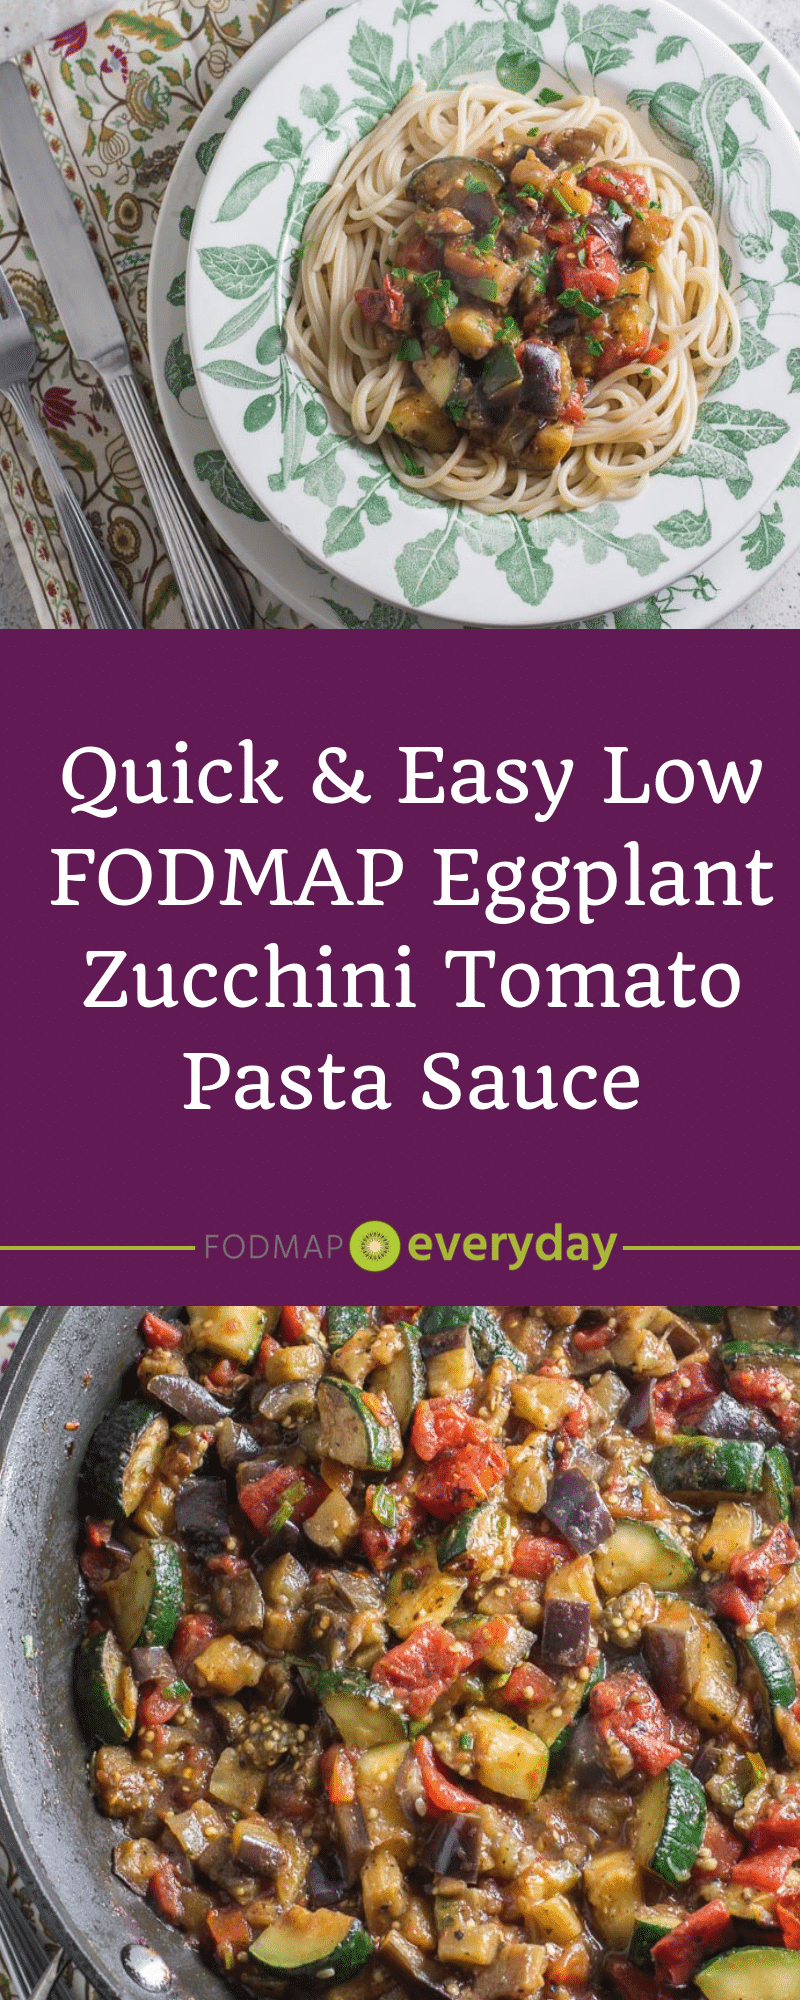 Quick Easy Low Fodmap Eggplant Zucchini Tomato Pasta Sauce